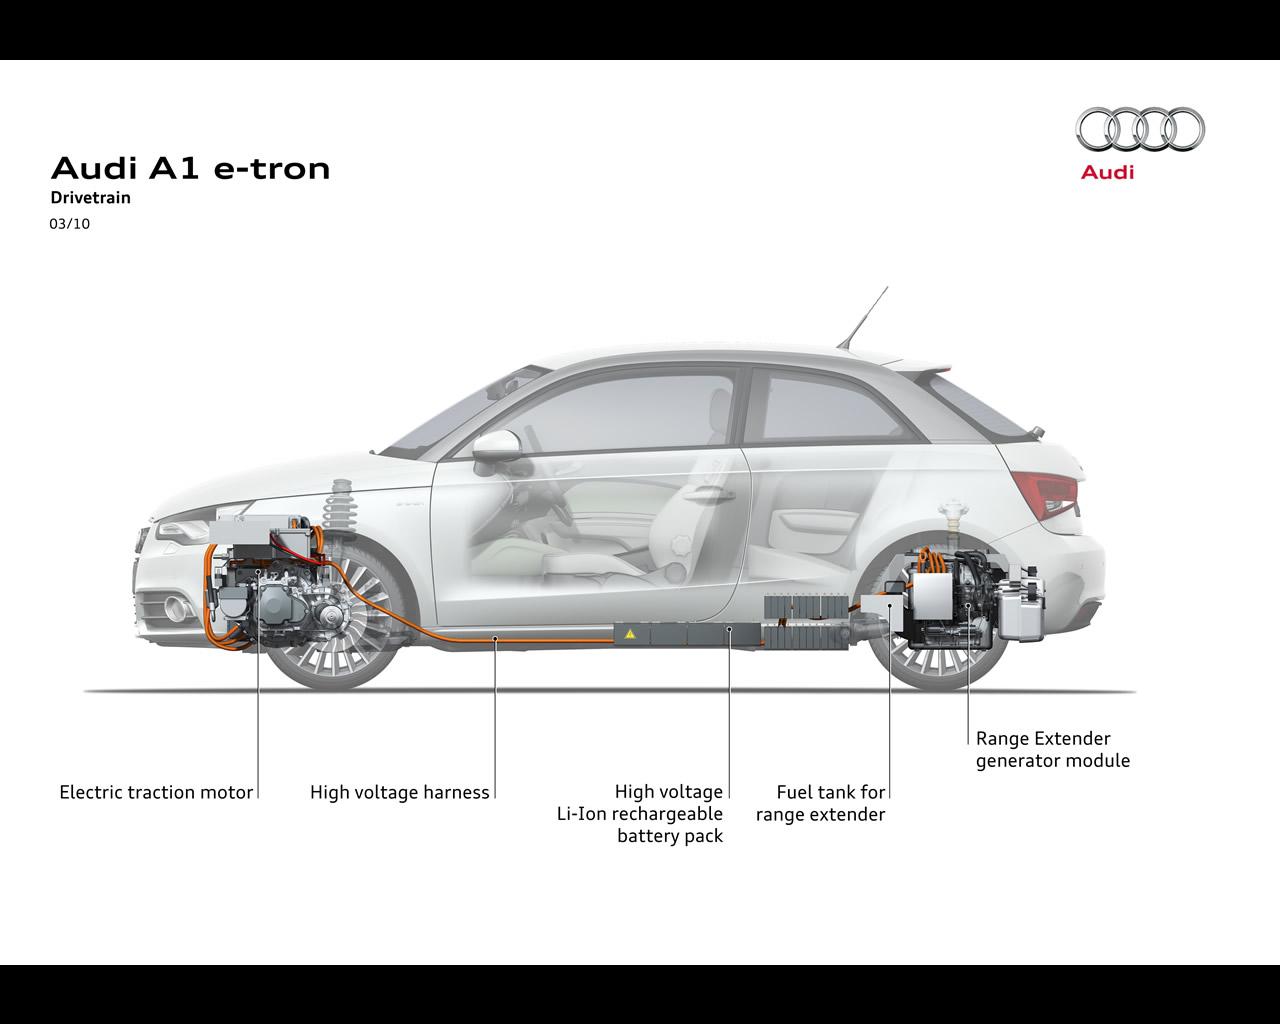 Audi A1 E Tron Electric Concept Car With Range Extender